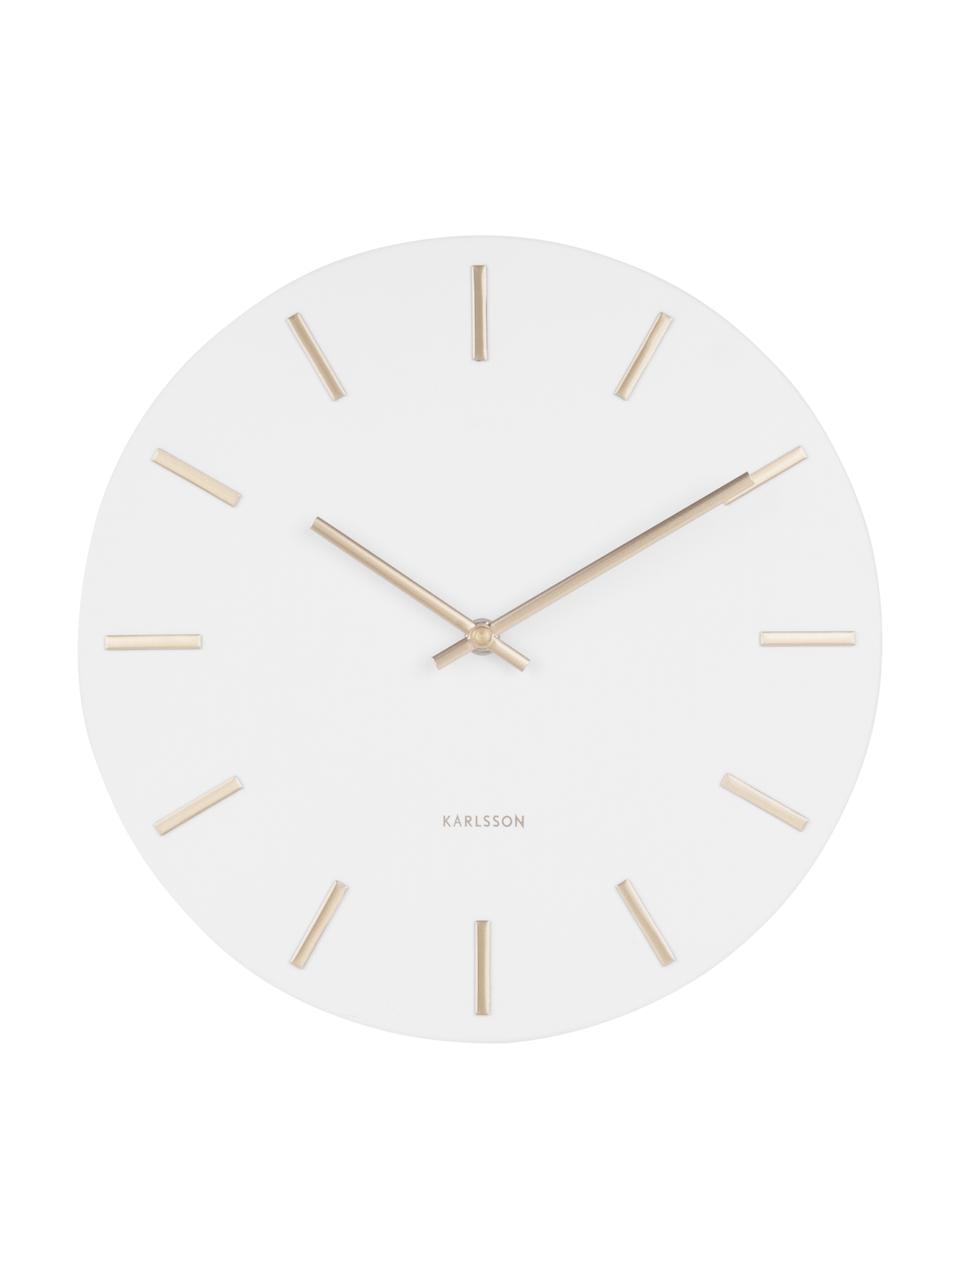 Orologio grande da parete Charm, Acciaio verniciato, Bianco, Ø 45 cm